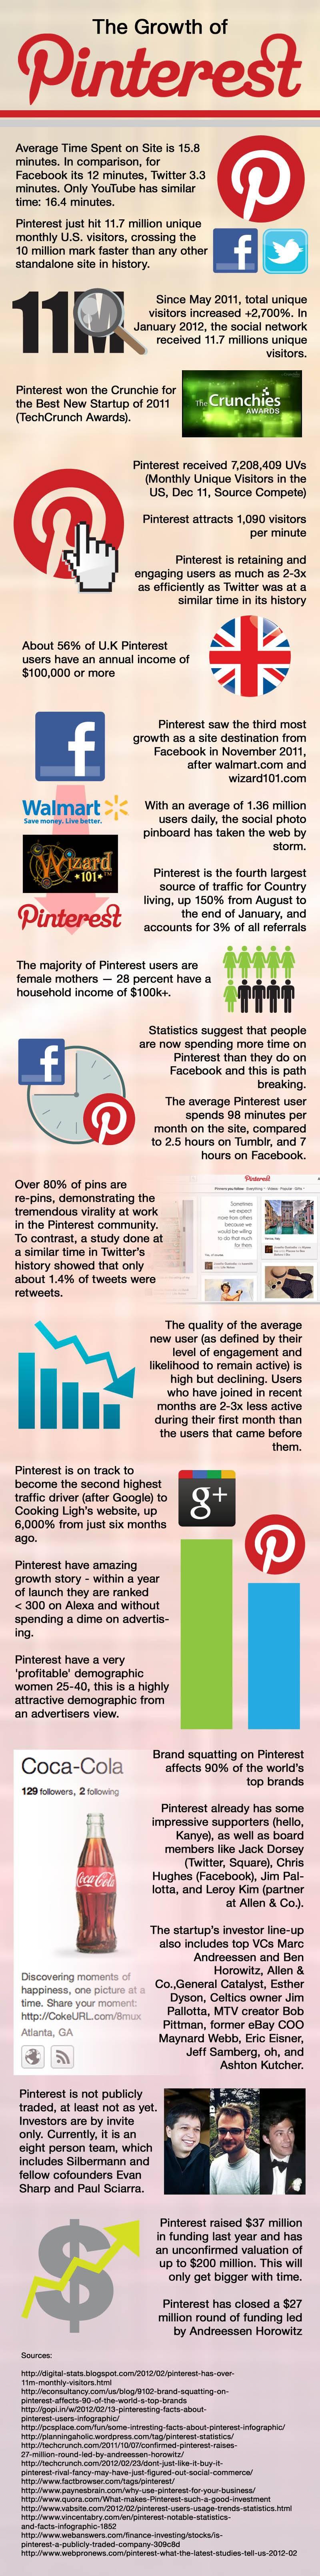 SVicm The Growth of Pinterest (Infographic)